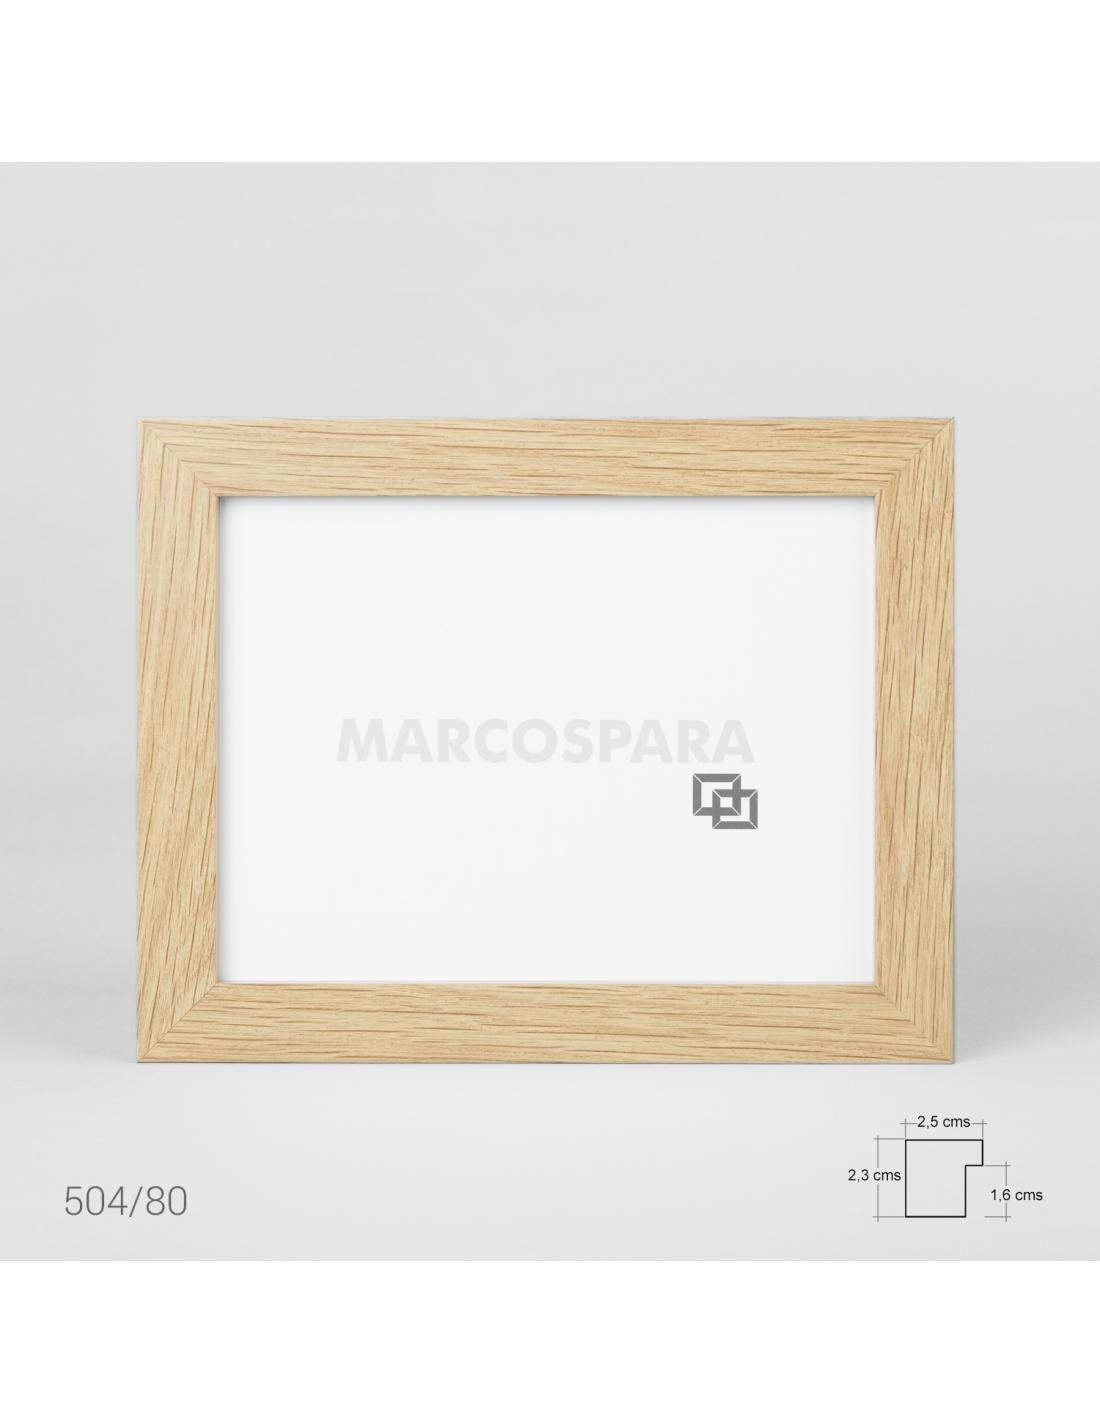 Marcos de madera para Puzzles M504